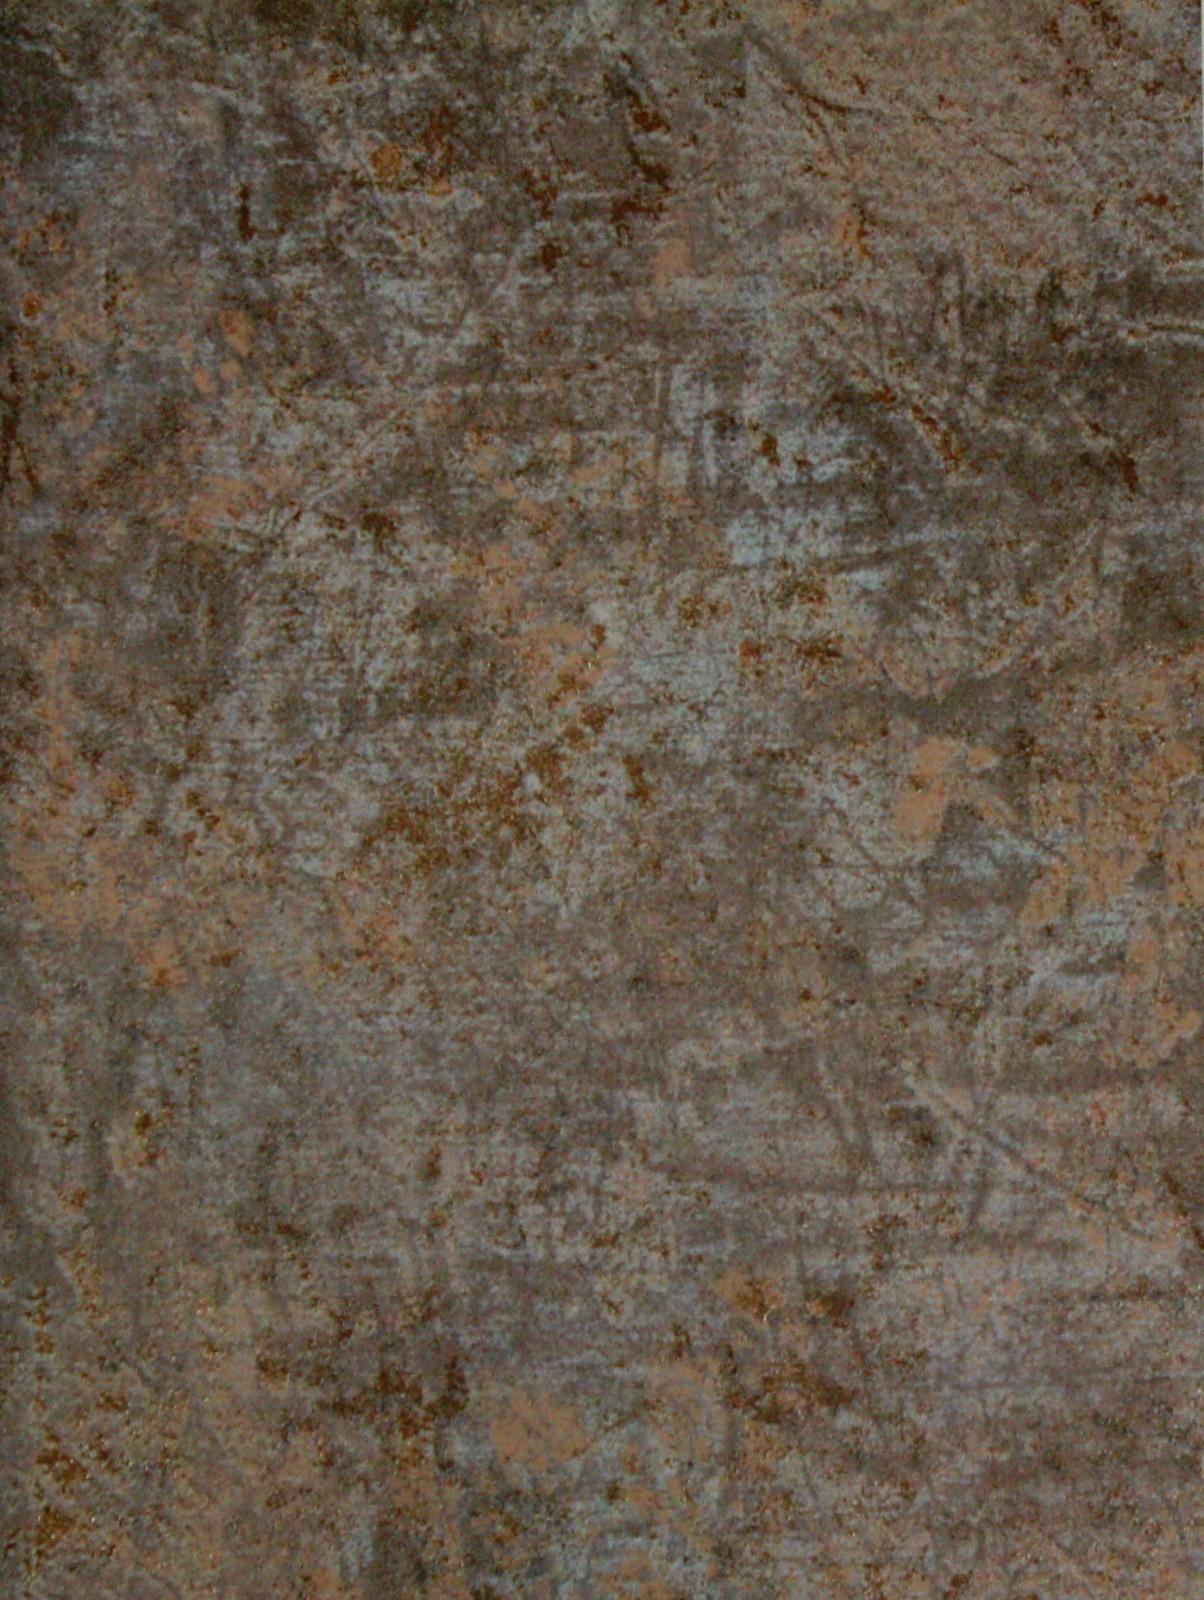 la veneziana vliestapete marburg tapete edel patina braun. Black Bedroom Furniture Sets. Home Design Ideas